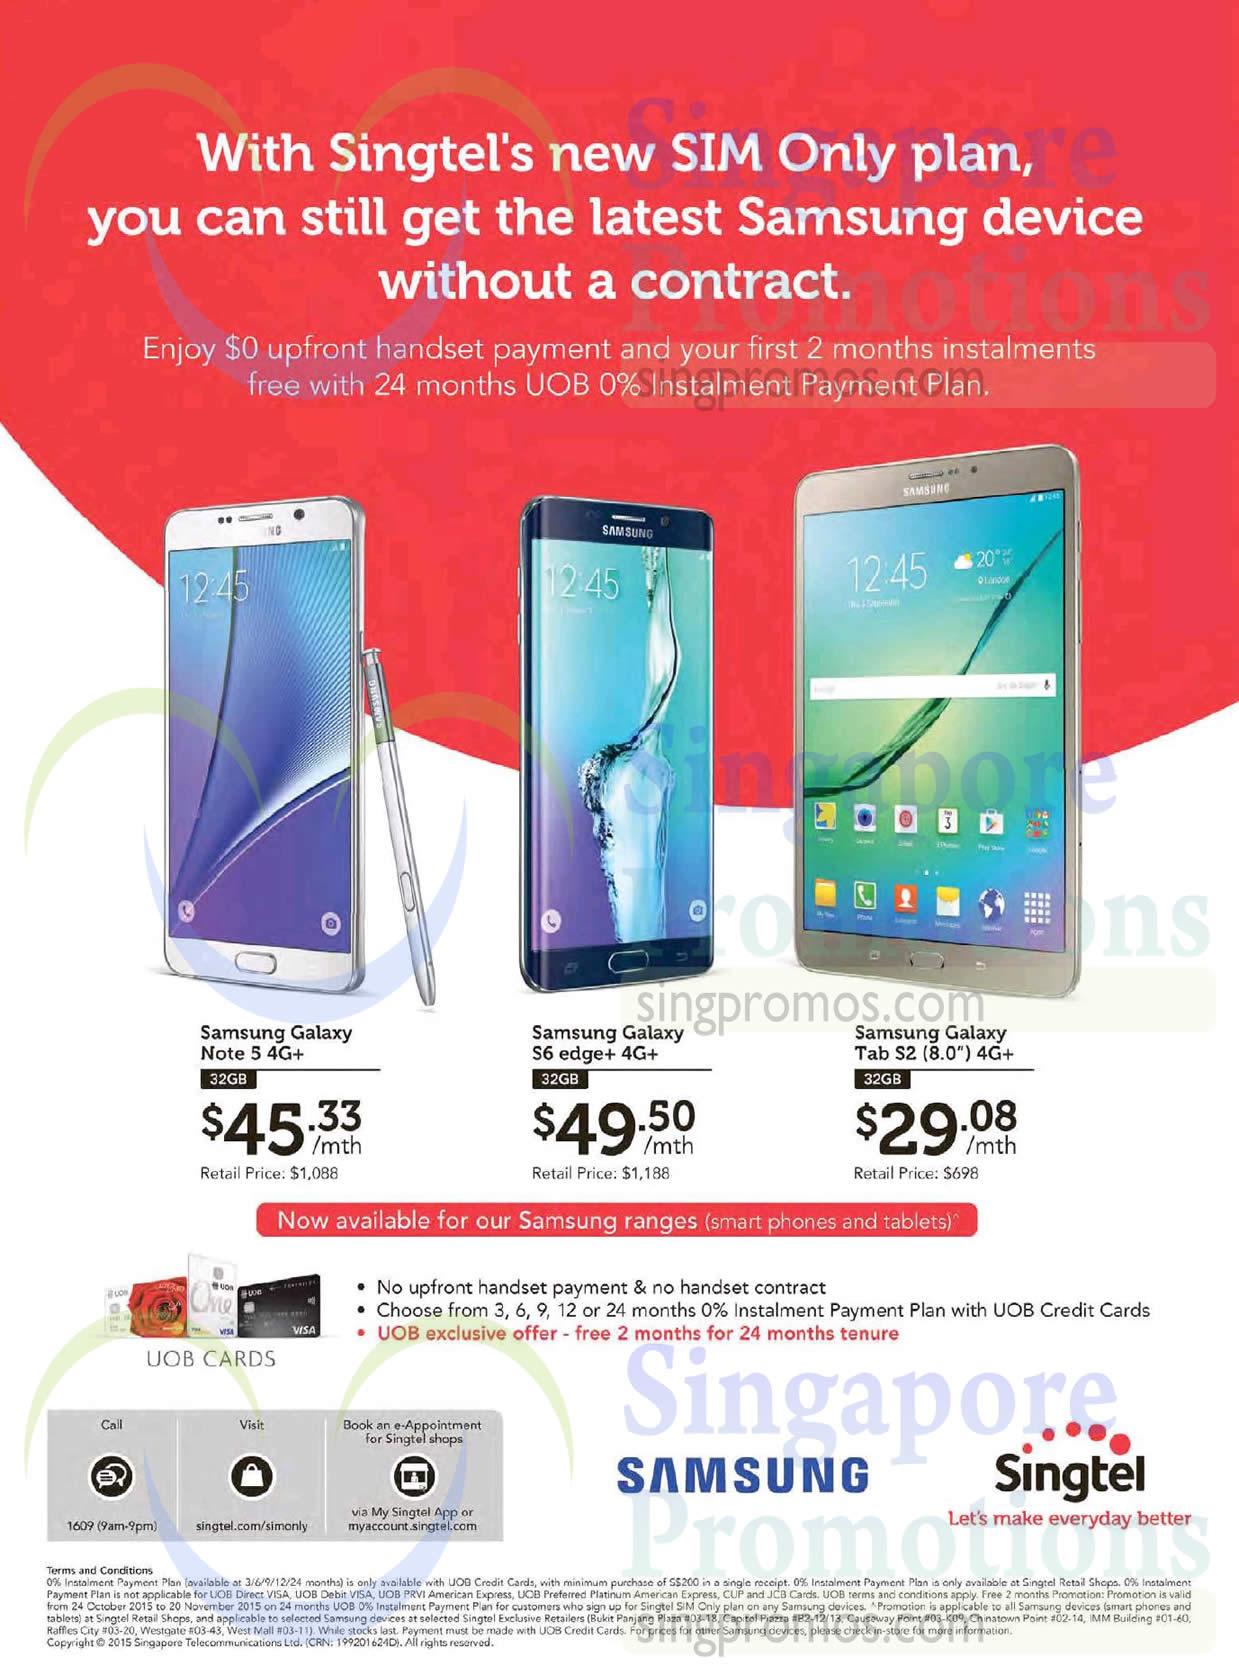 Samsung Galaxy Note 5, Samsung Galaxy S6 Edge Plus, Samsung Galaxy Tab S2 8.0